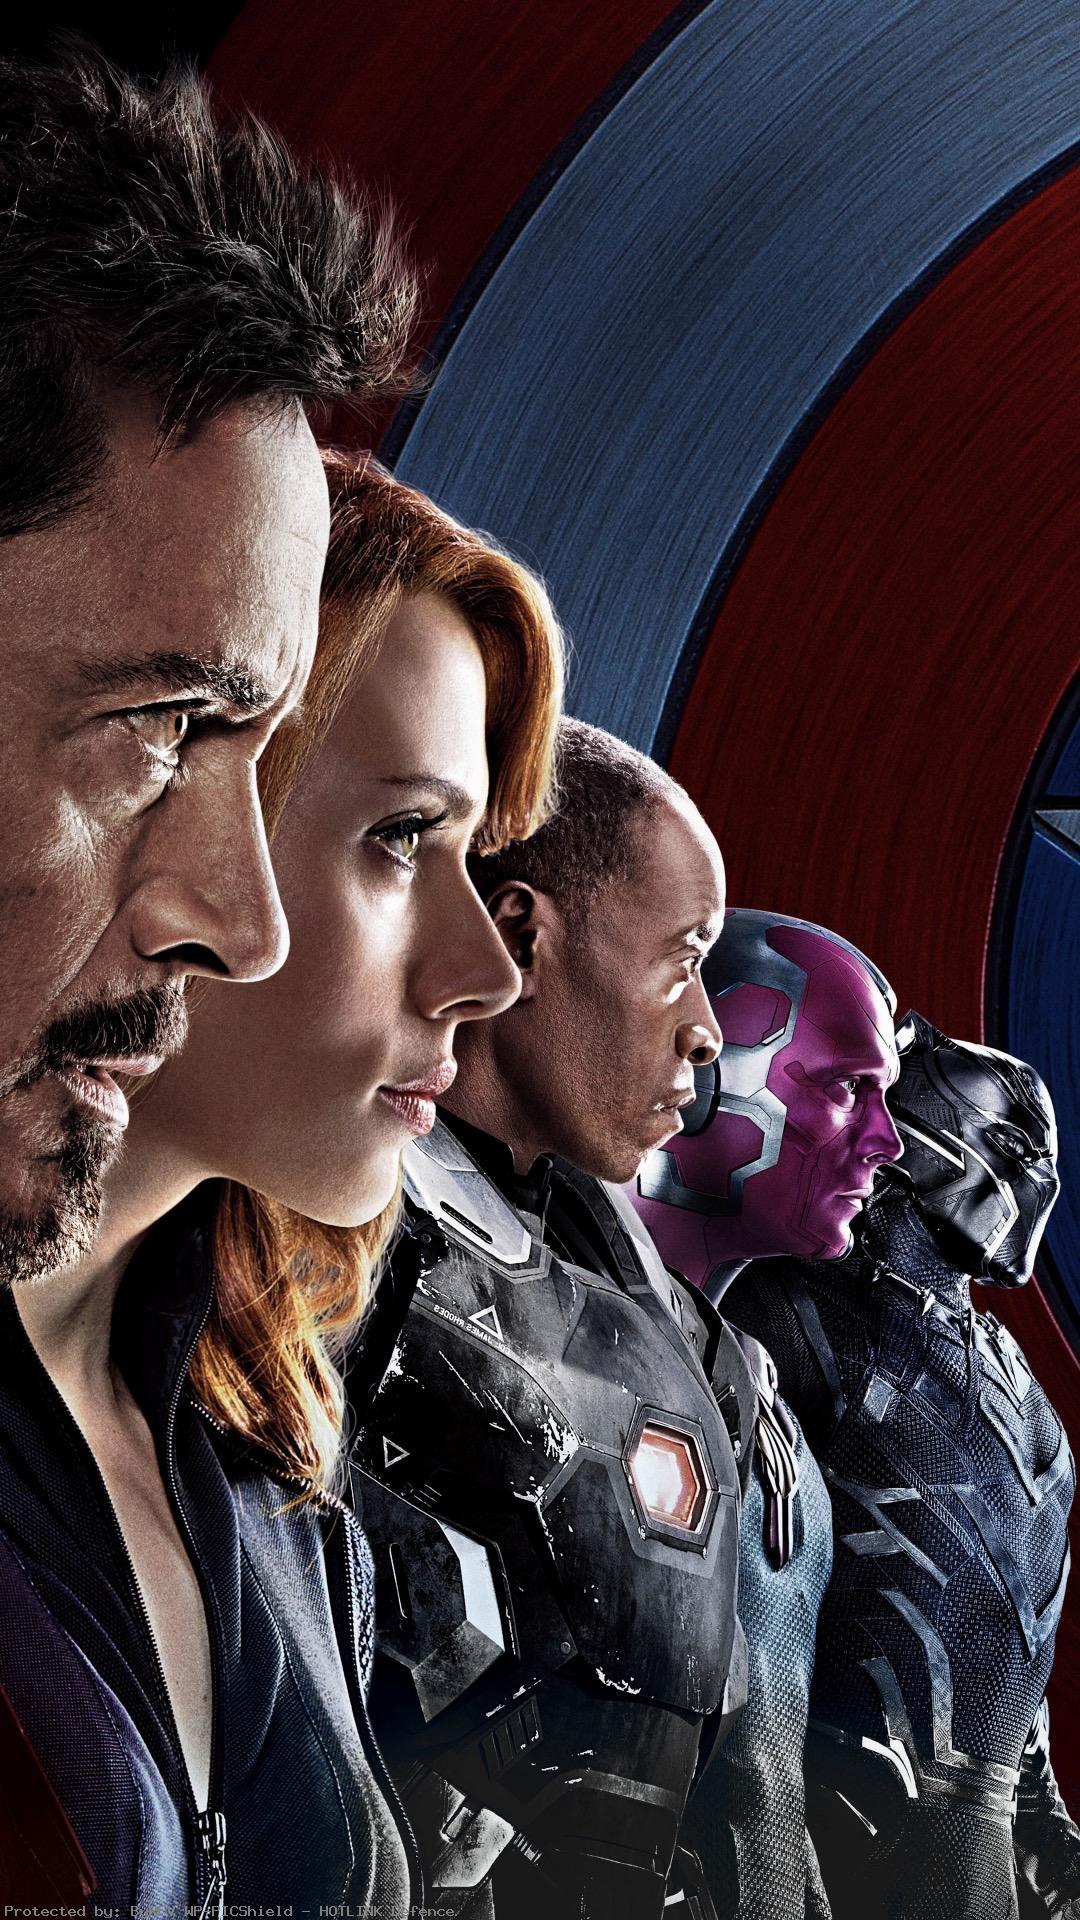 Captain-America-Civil-War-Team-Stark-and-Black-